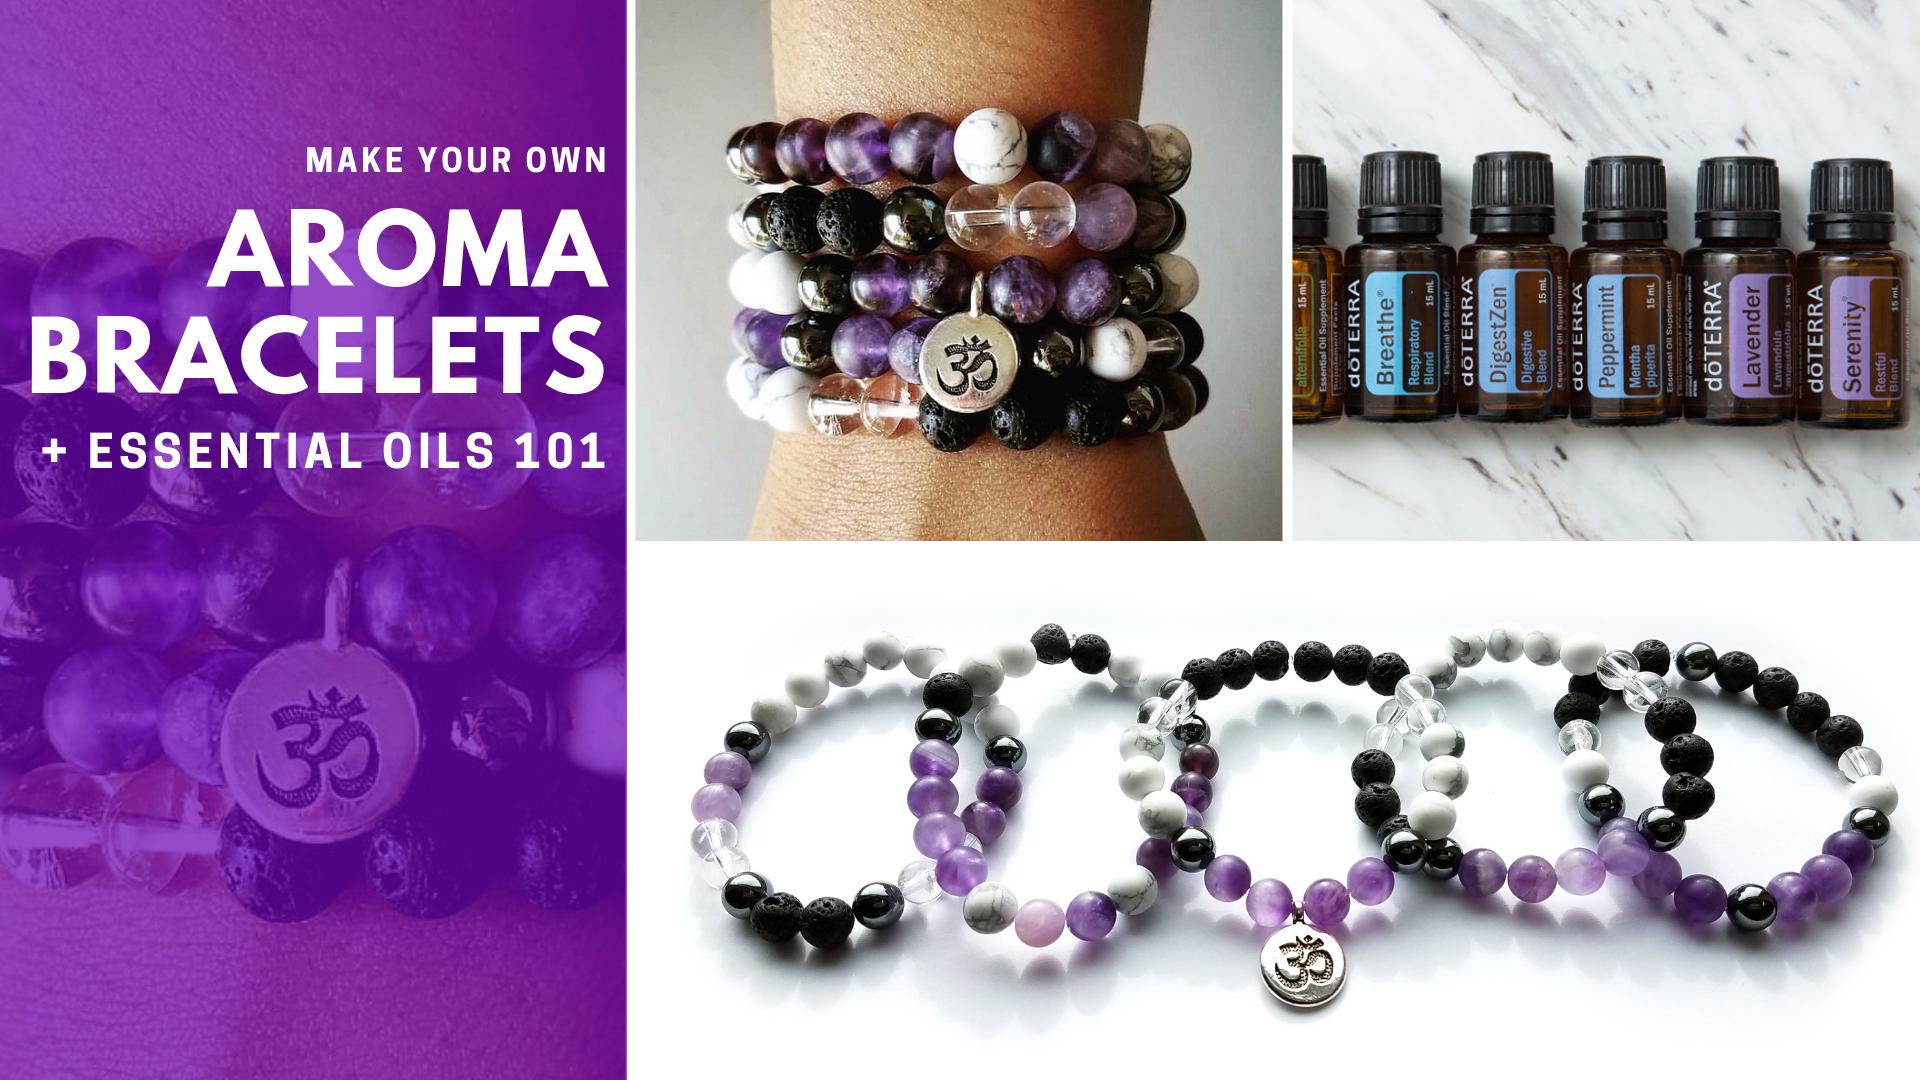 Aroma Bracelets - Bonita Springs - Essential Oils - Estero Florida - Lava Bracelets - DIY Bracelet.png